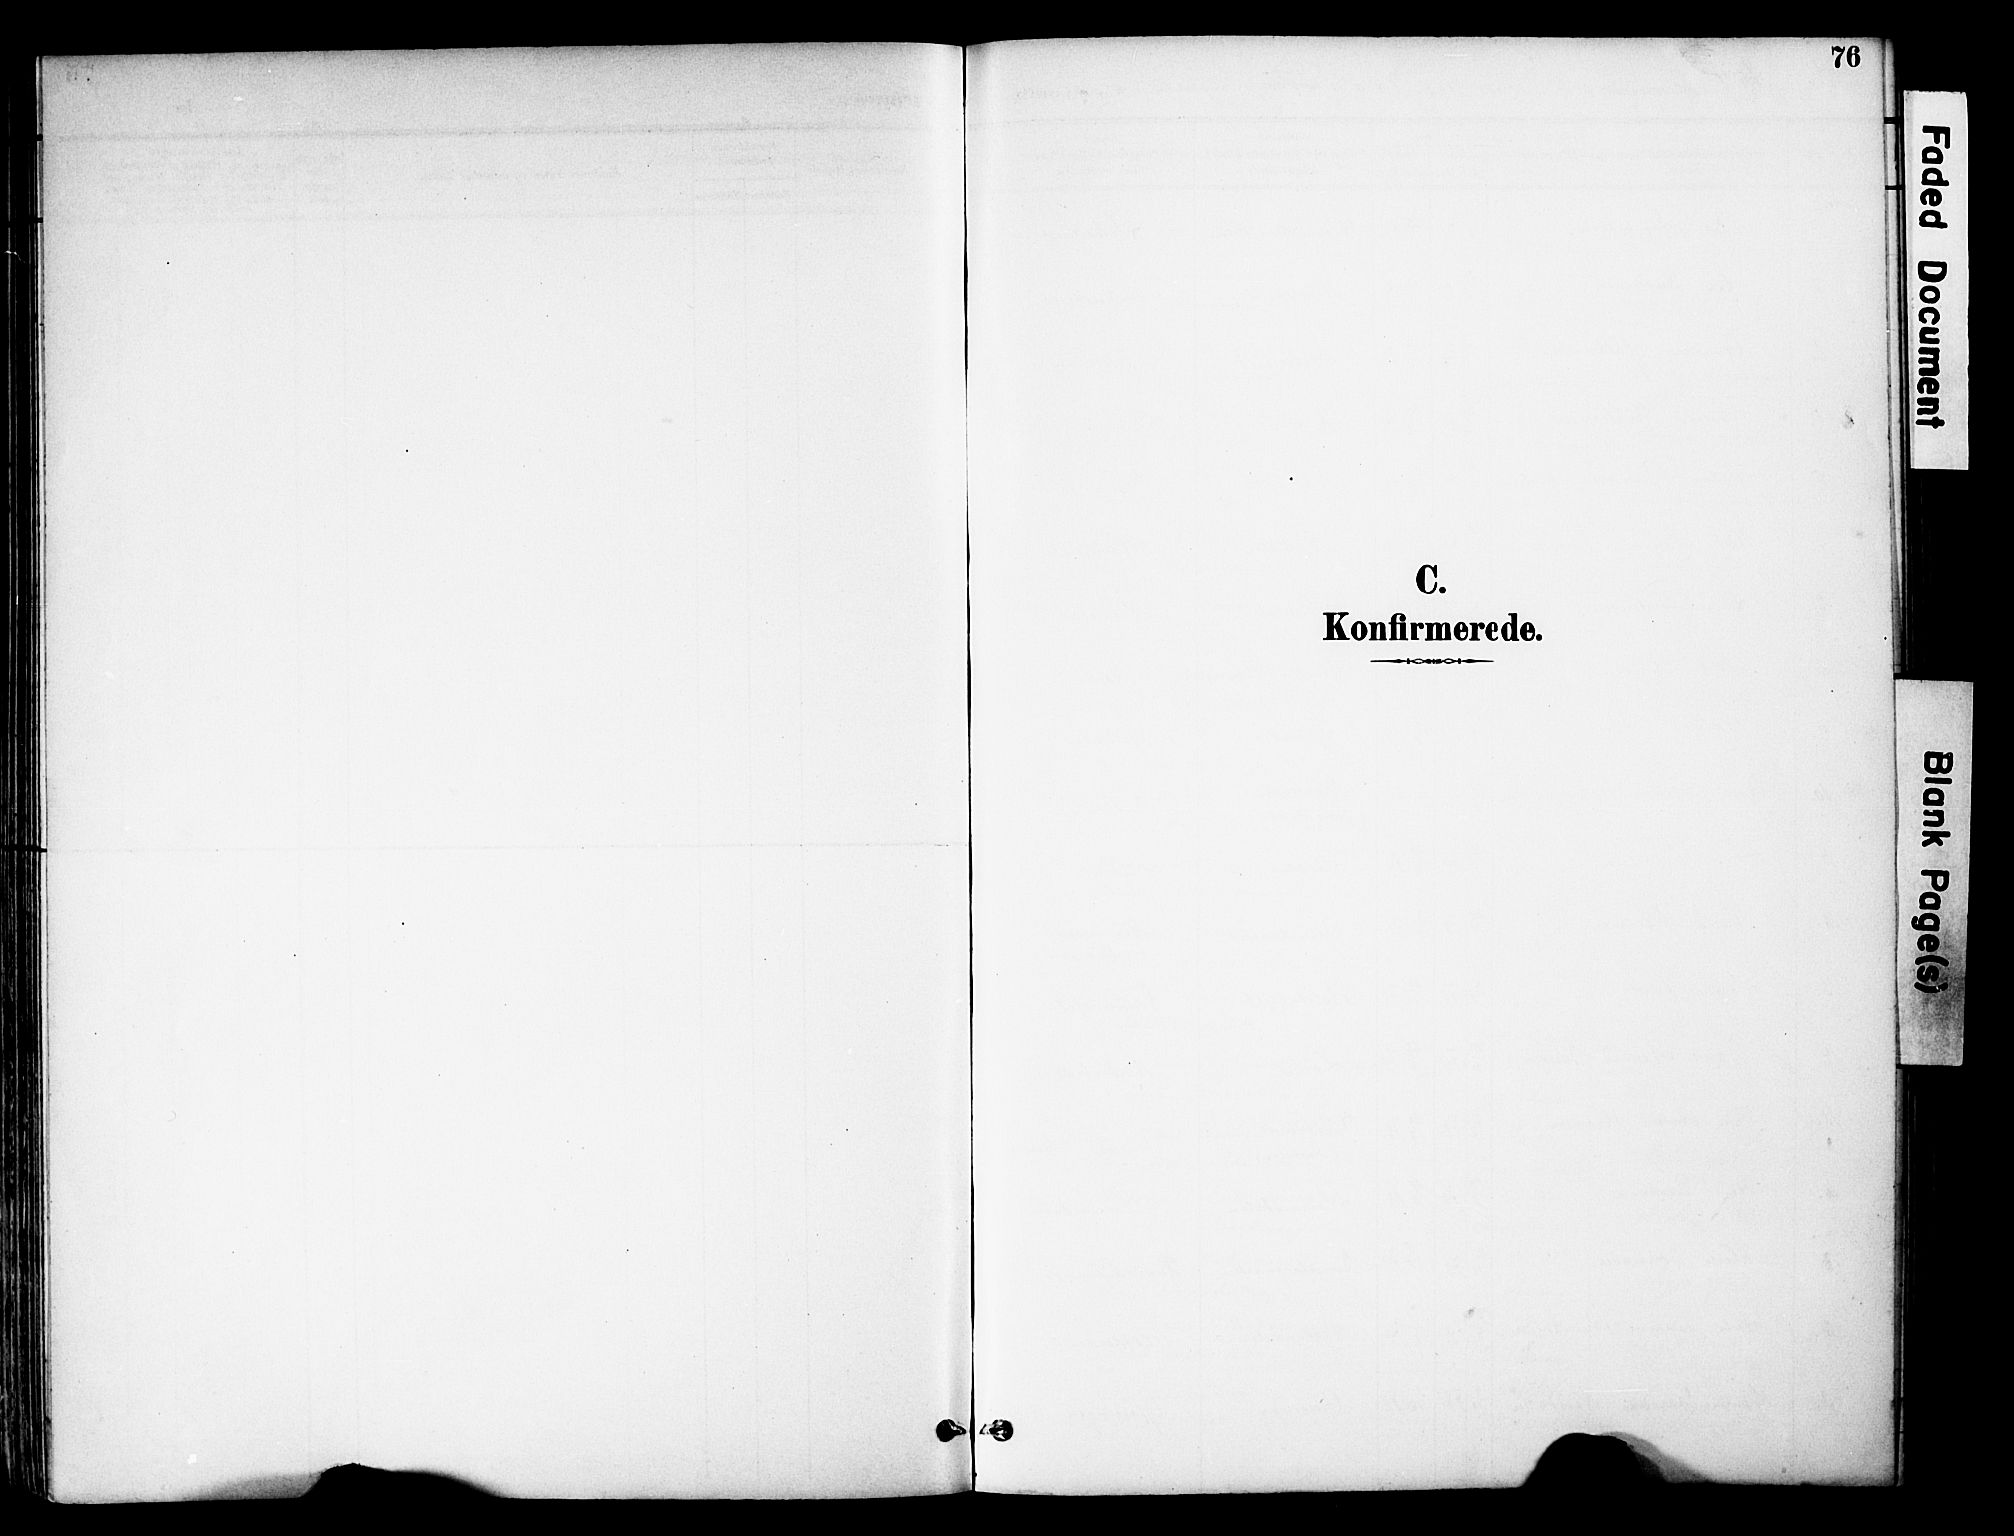 SAH, Brandbu prestekontor, Klokkerbok nr. 6, 1893-1902, s. 76